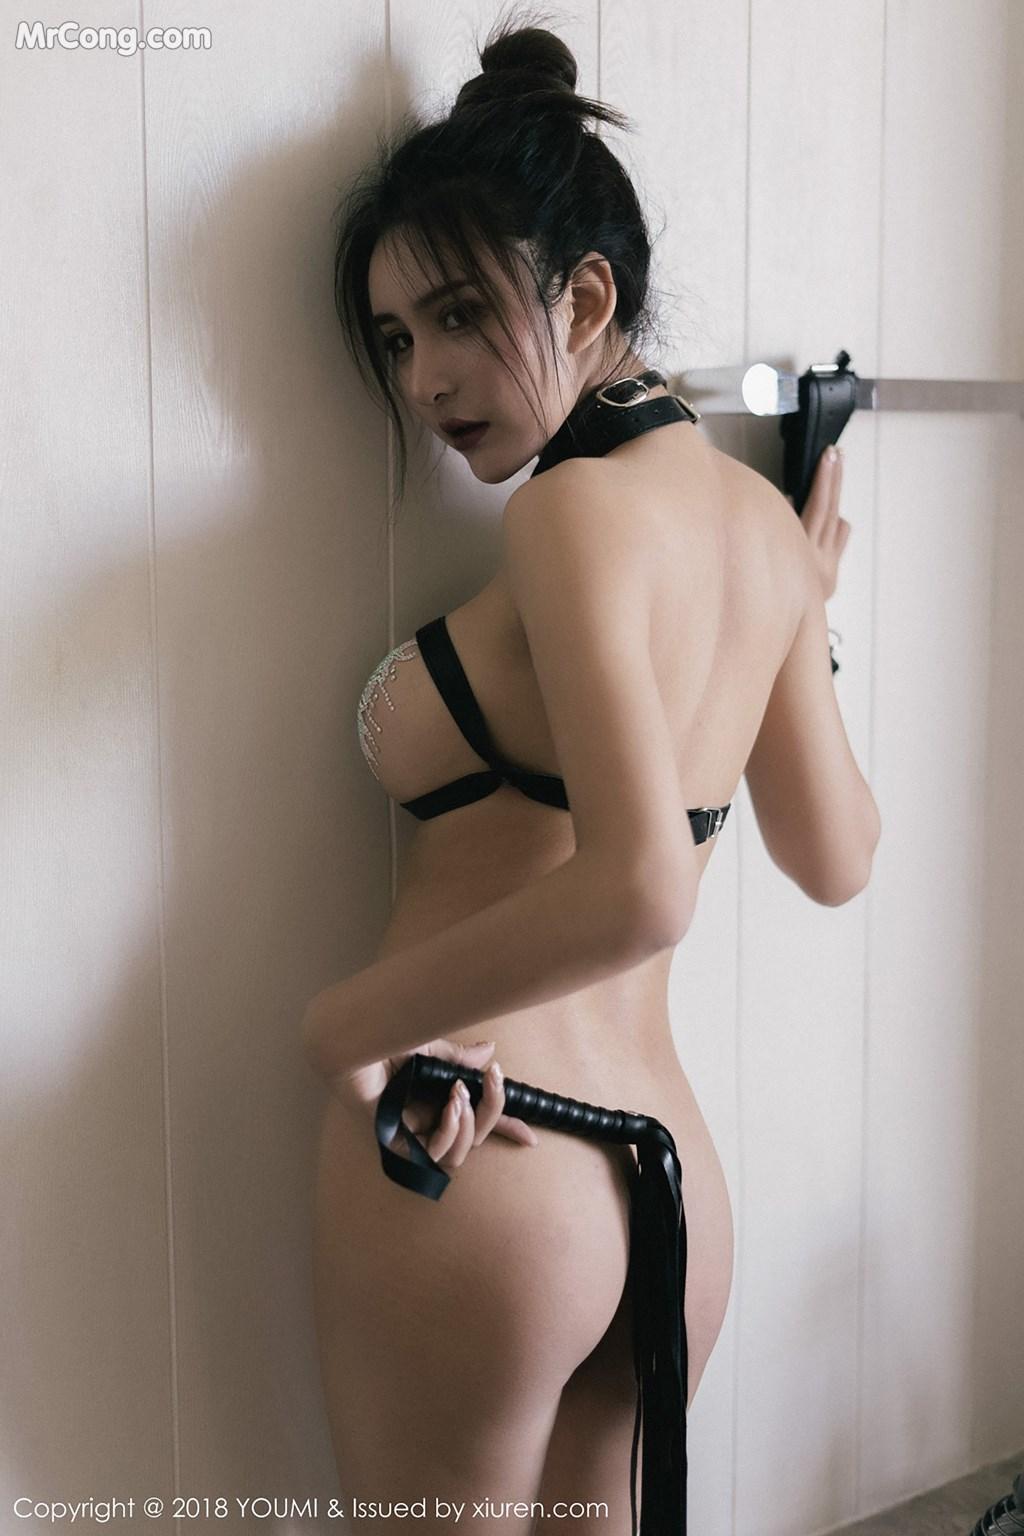 Image YouMi-Vol.226-SOLO-MrCong.com-004 in post YouMi Vol.226: Người mẫu SOLO-尹菲 (41 ảnh)